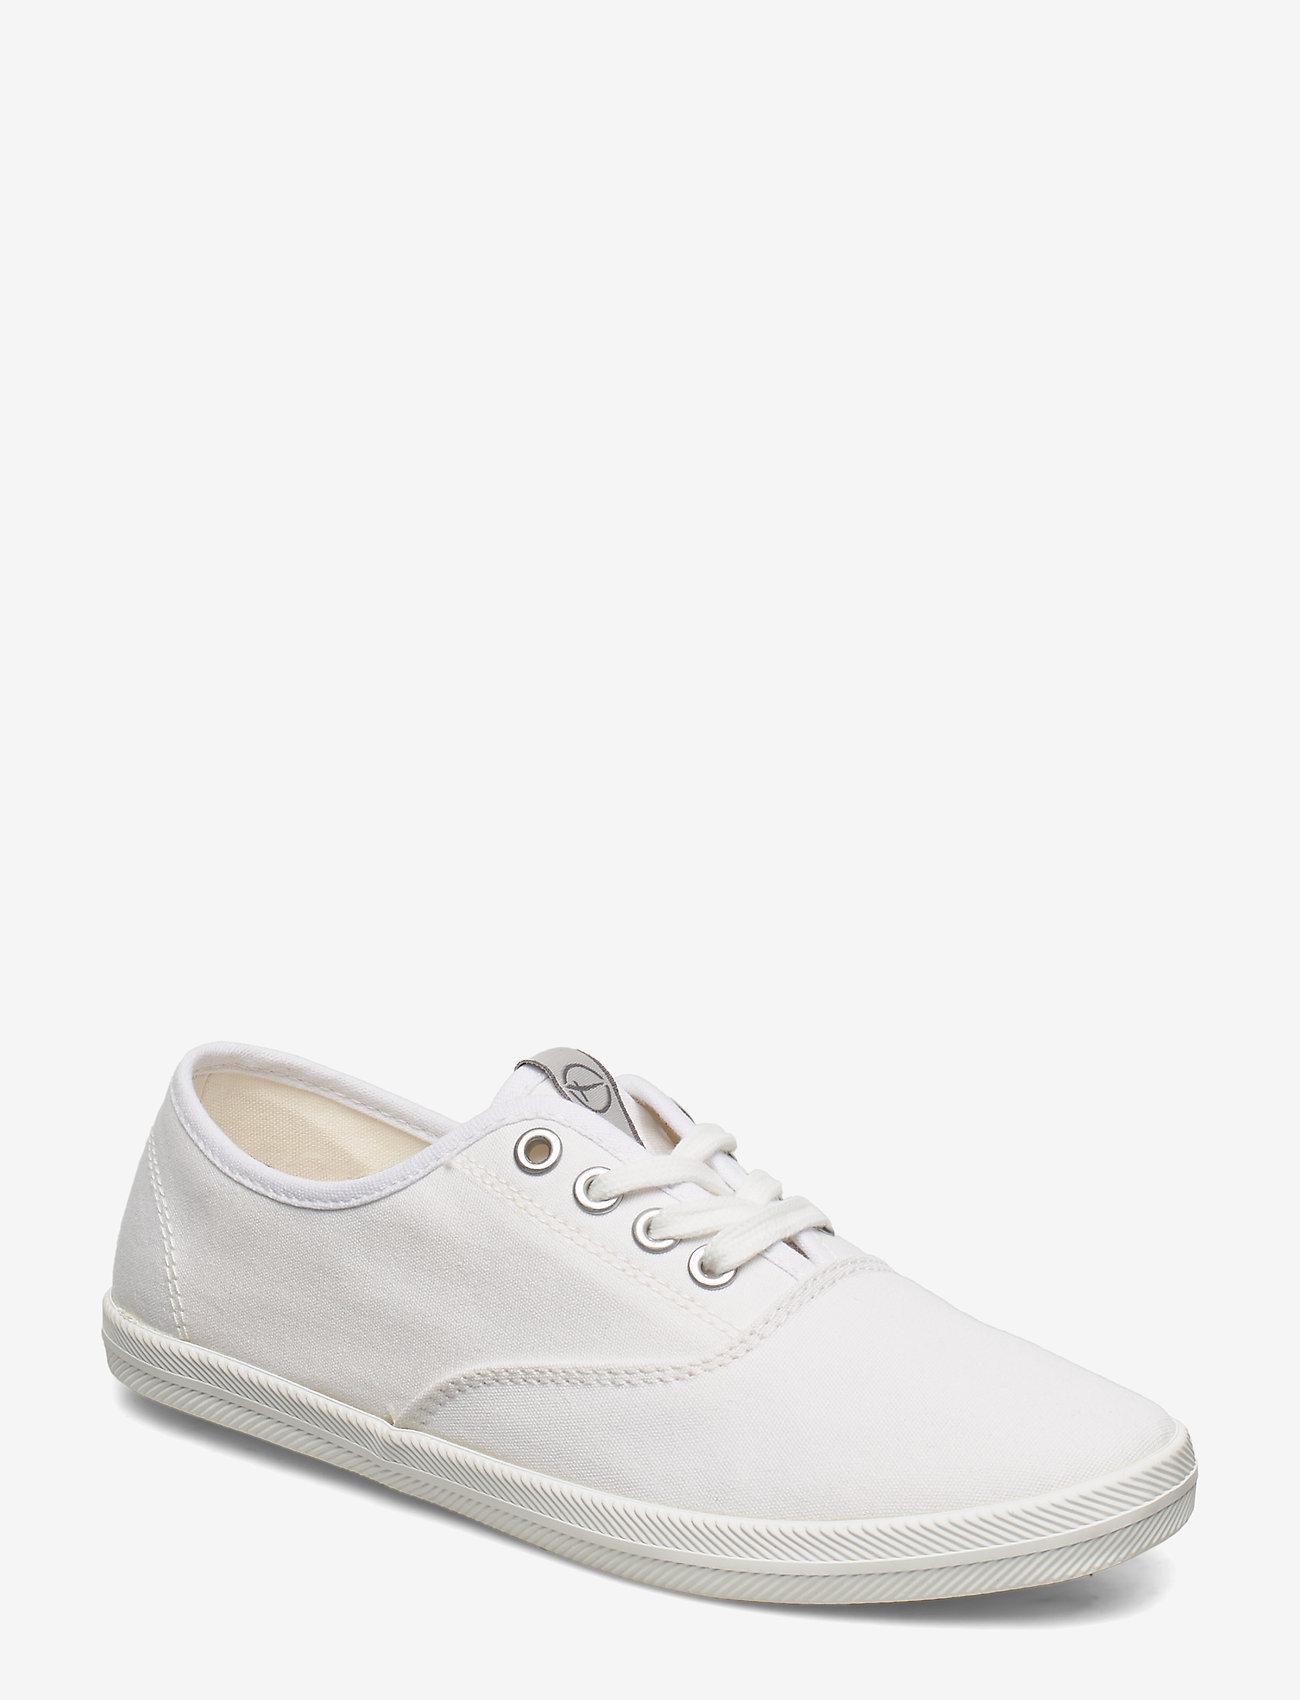 Tamaris - Woms Lace-up - låga sneakers - white - 0